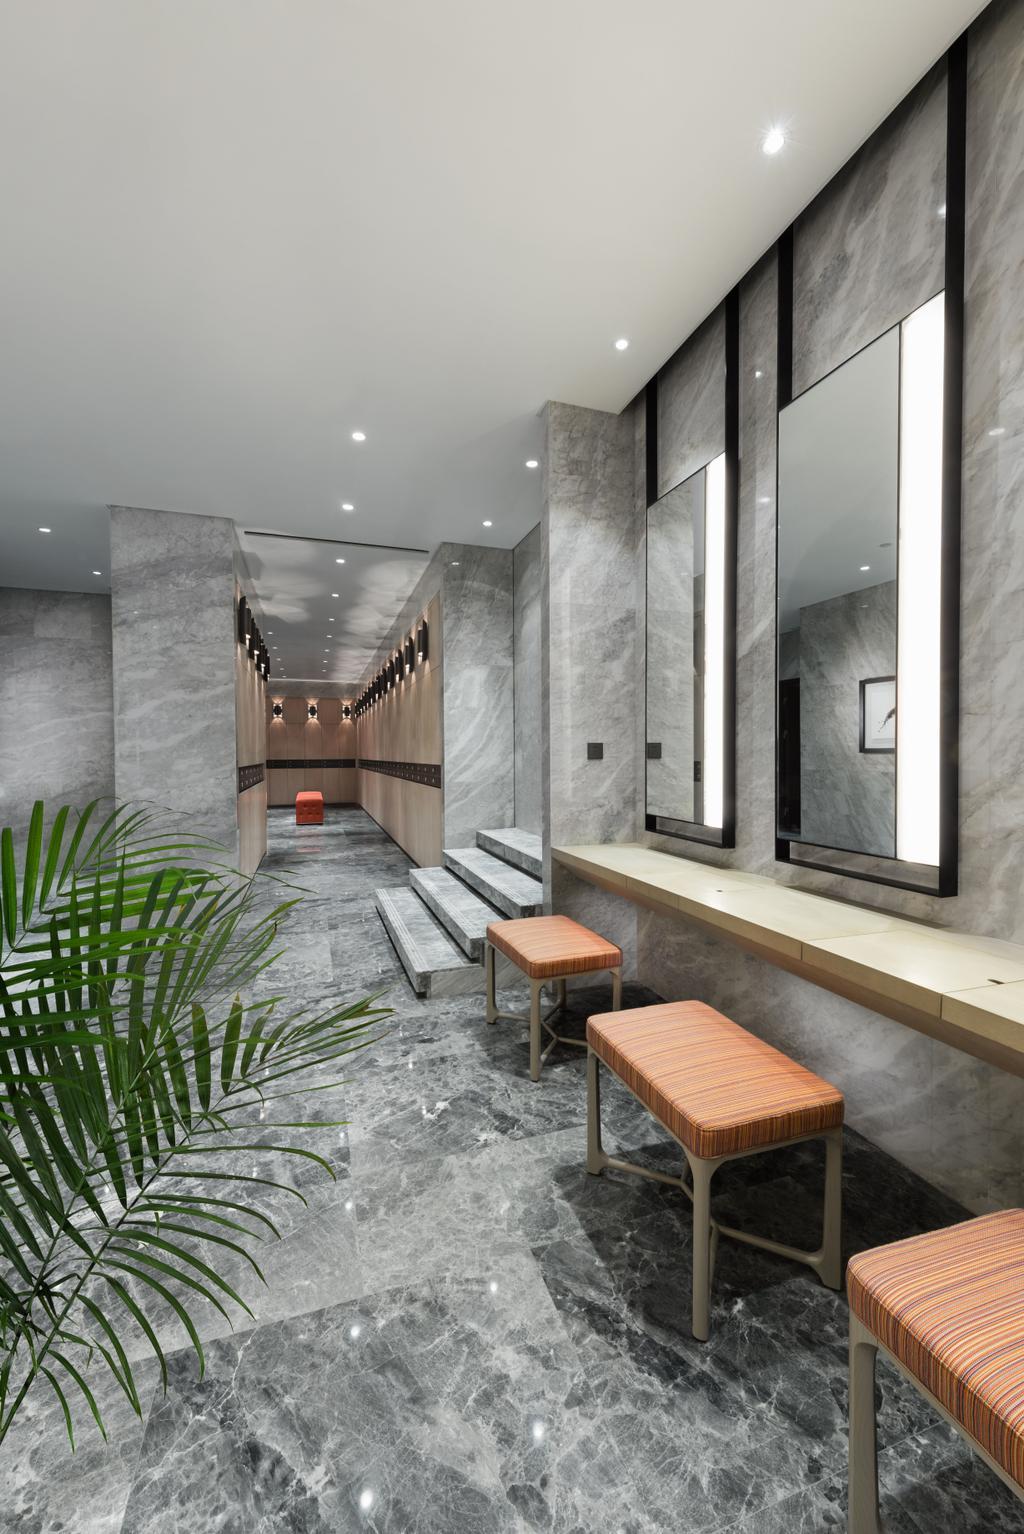 Gallery Clubhouse, Commercial, Interior Designer, A.RK Interior Design, Modern, Bathroom, Chair, Furniture, HDB, Building, Housing, Indoors, Loft